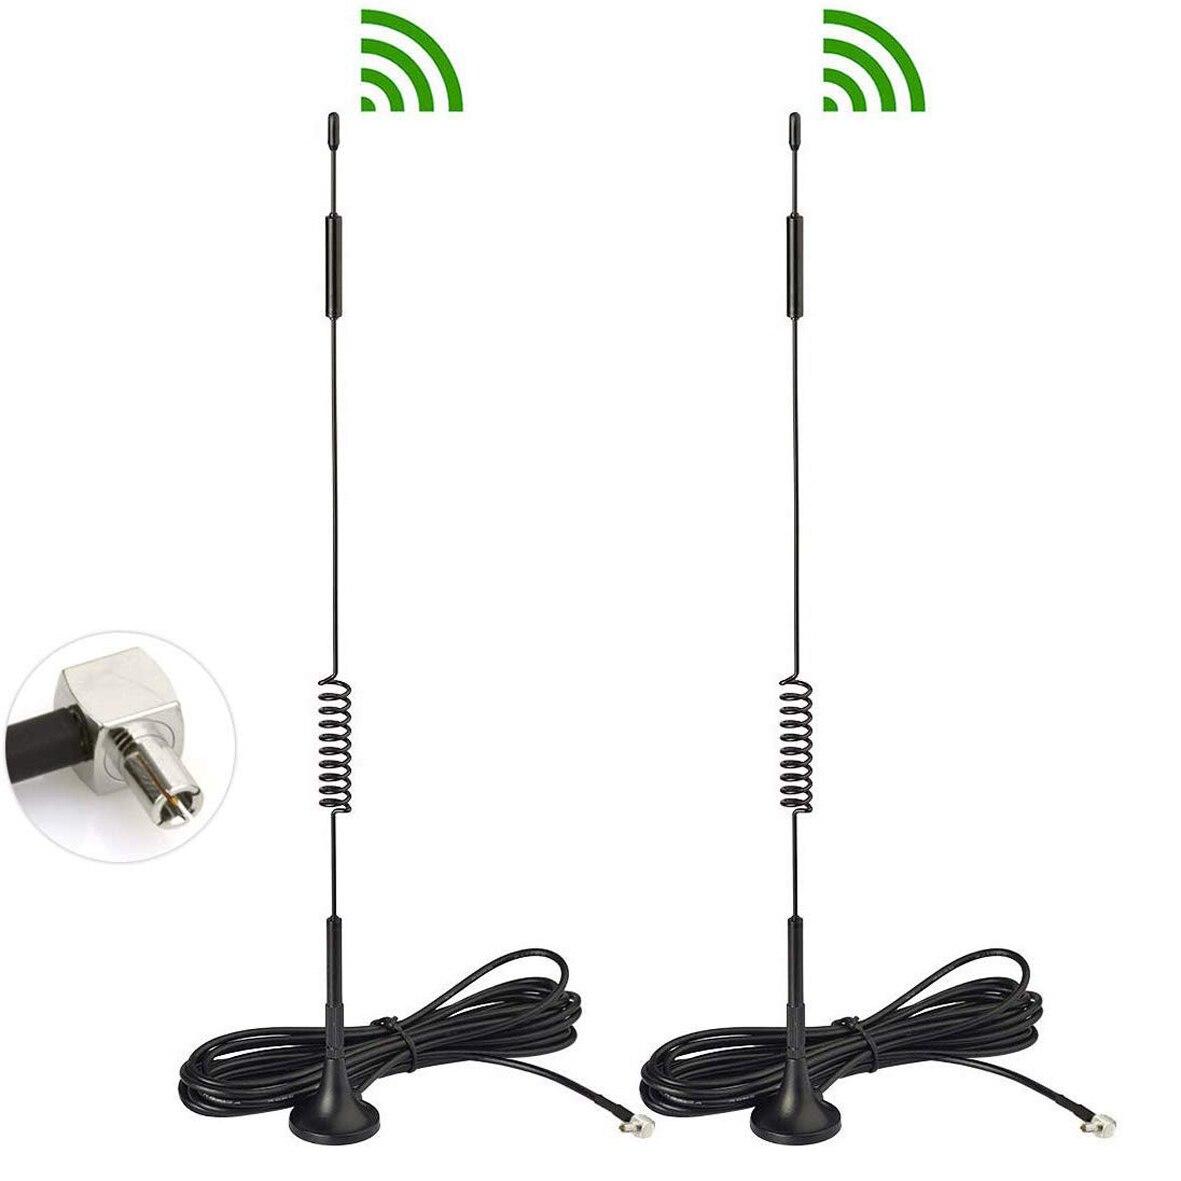 4-Pack 4G LTE TS9 Antenna for 4G LTE USB Modem MiFi Mobile WiFi Router Hotspot